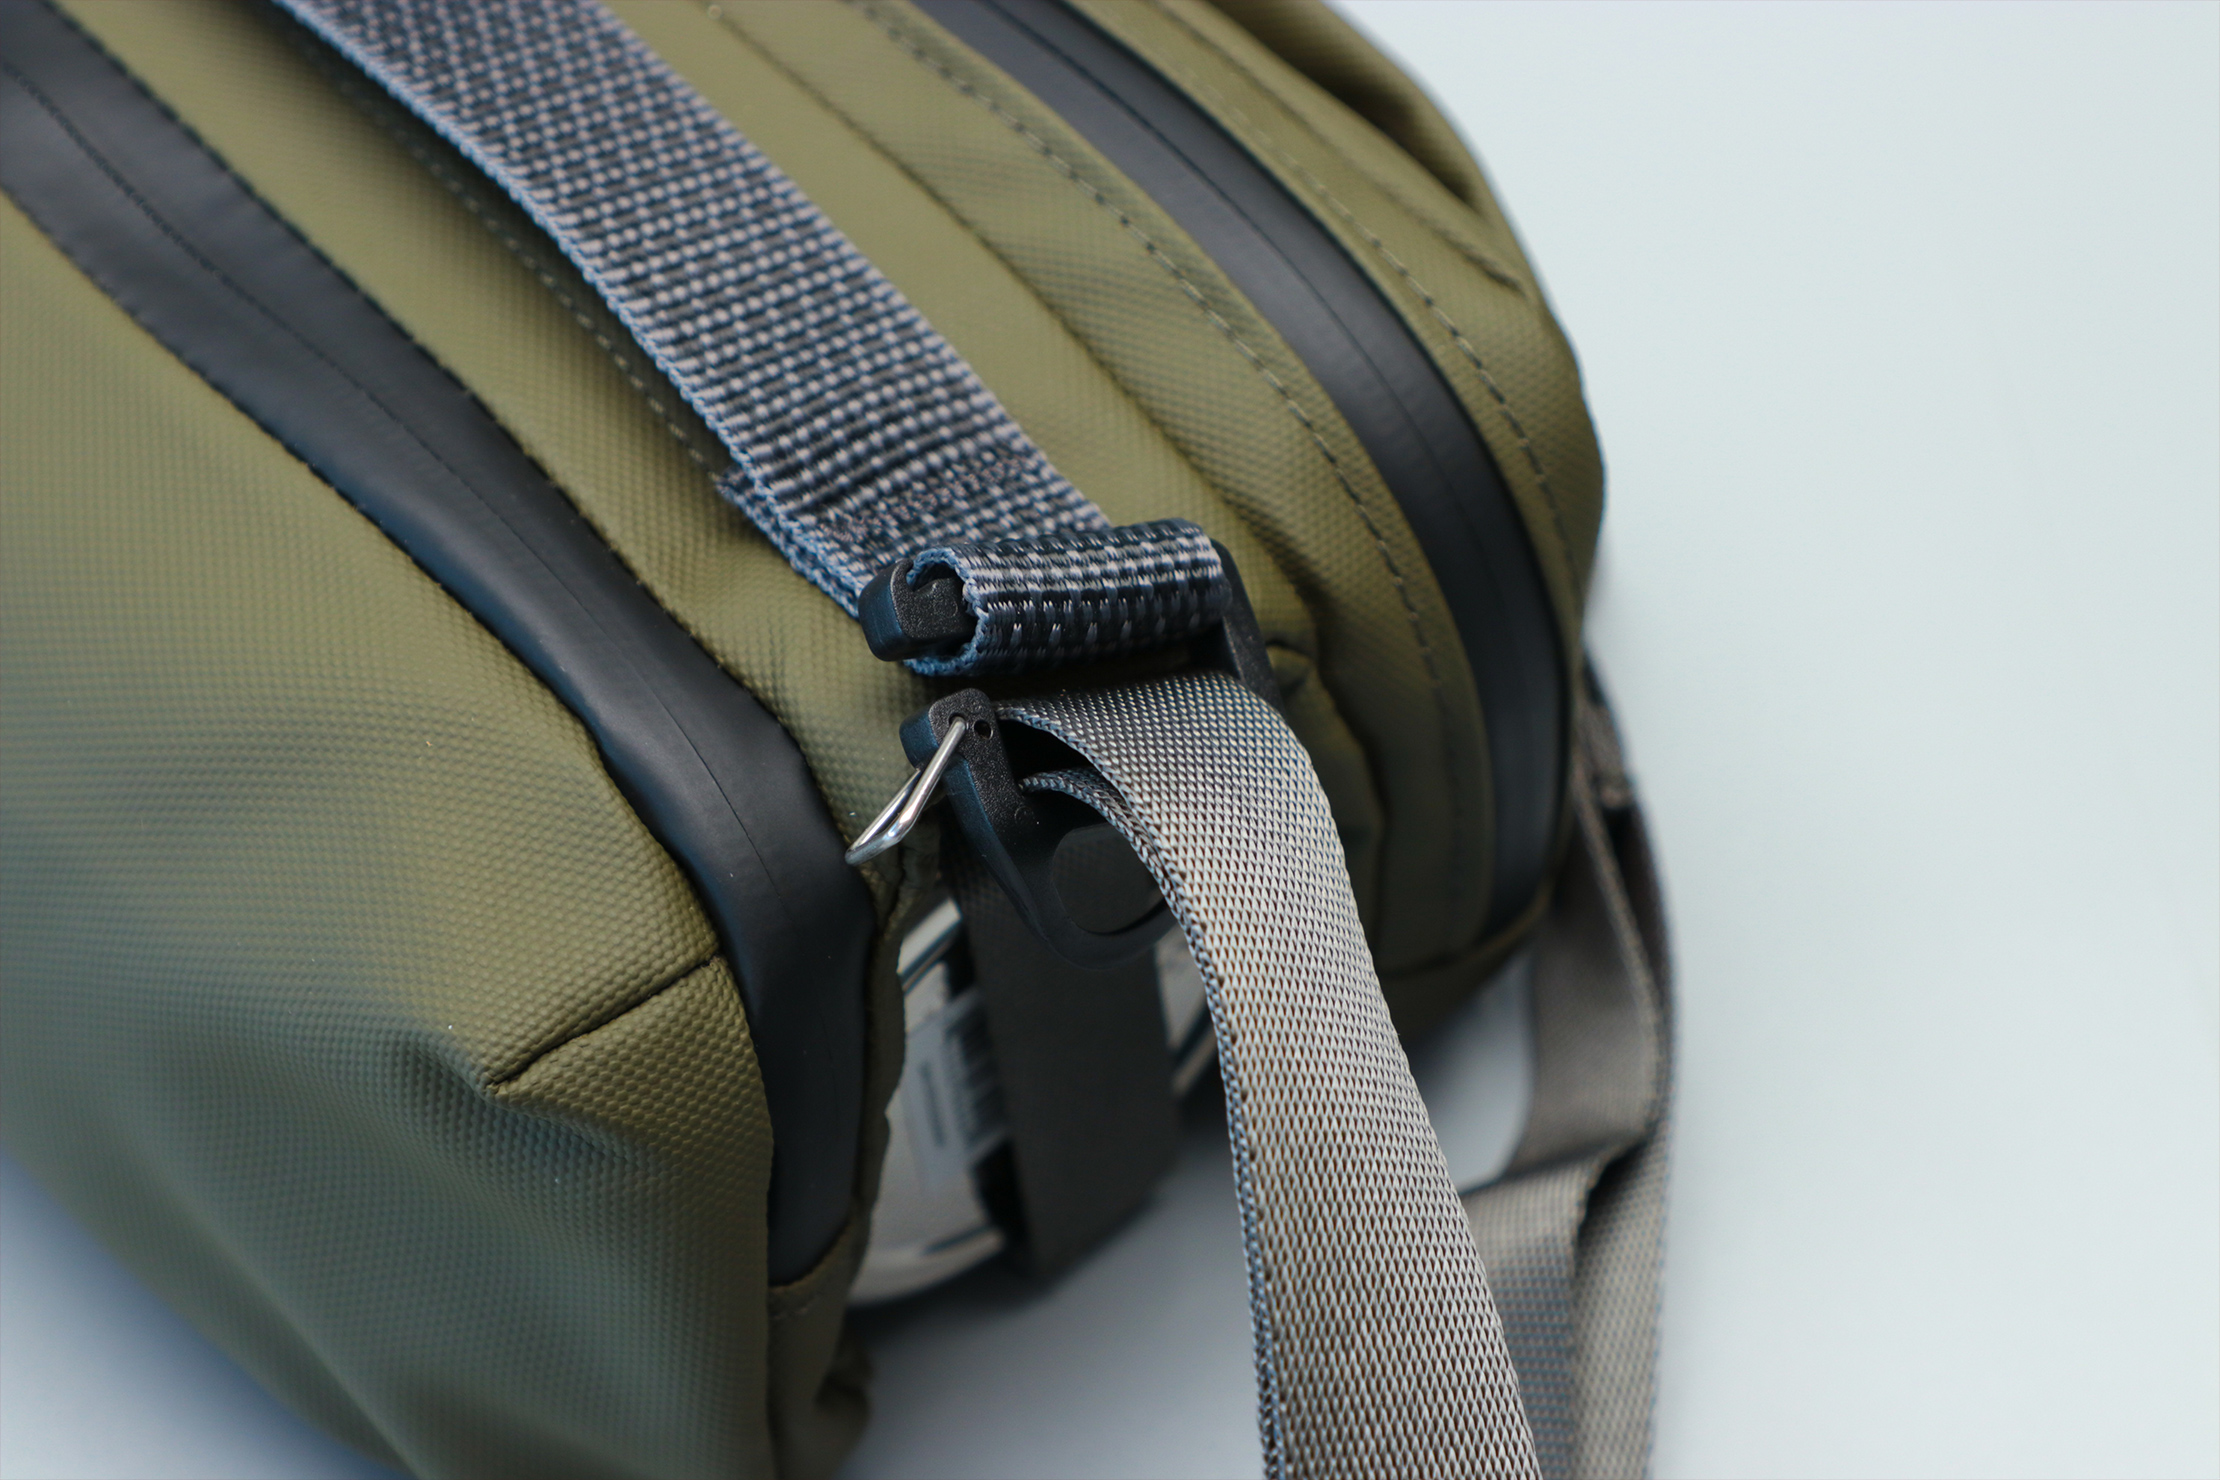 Topologie Brick Pouch Strap Closeup